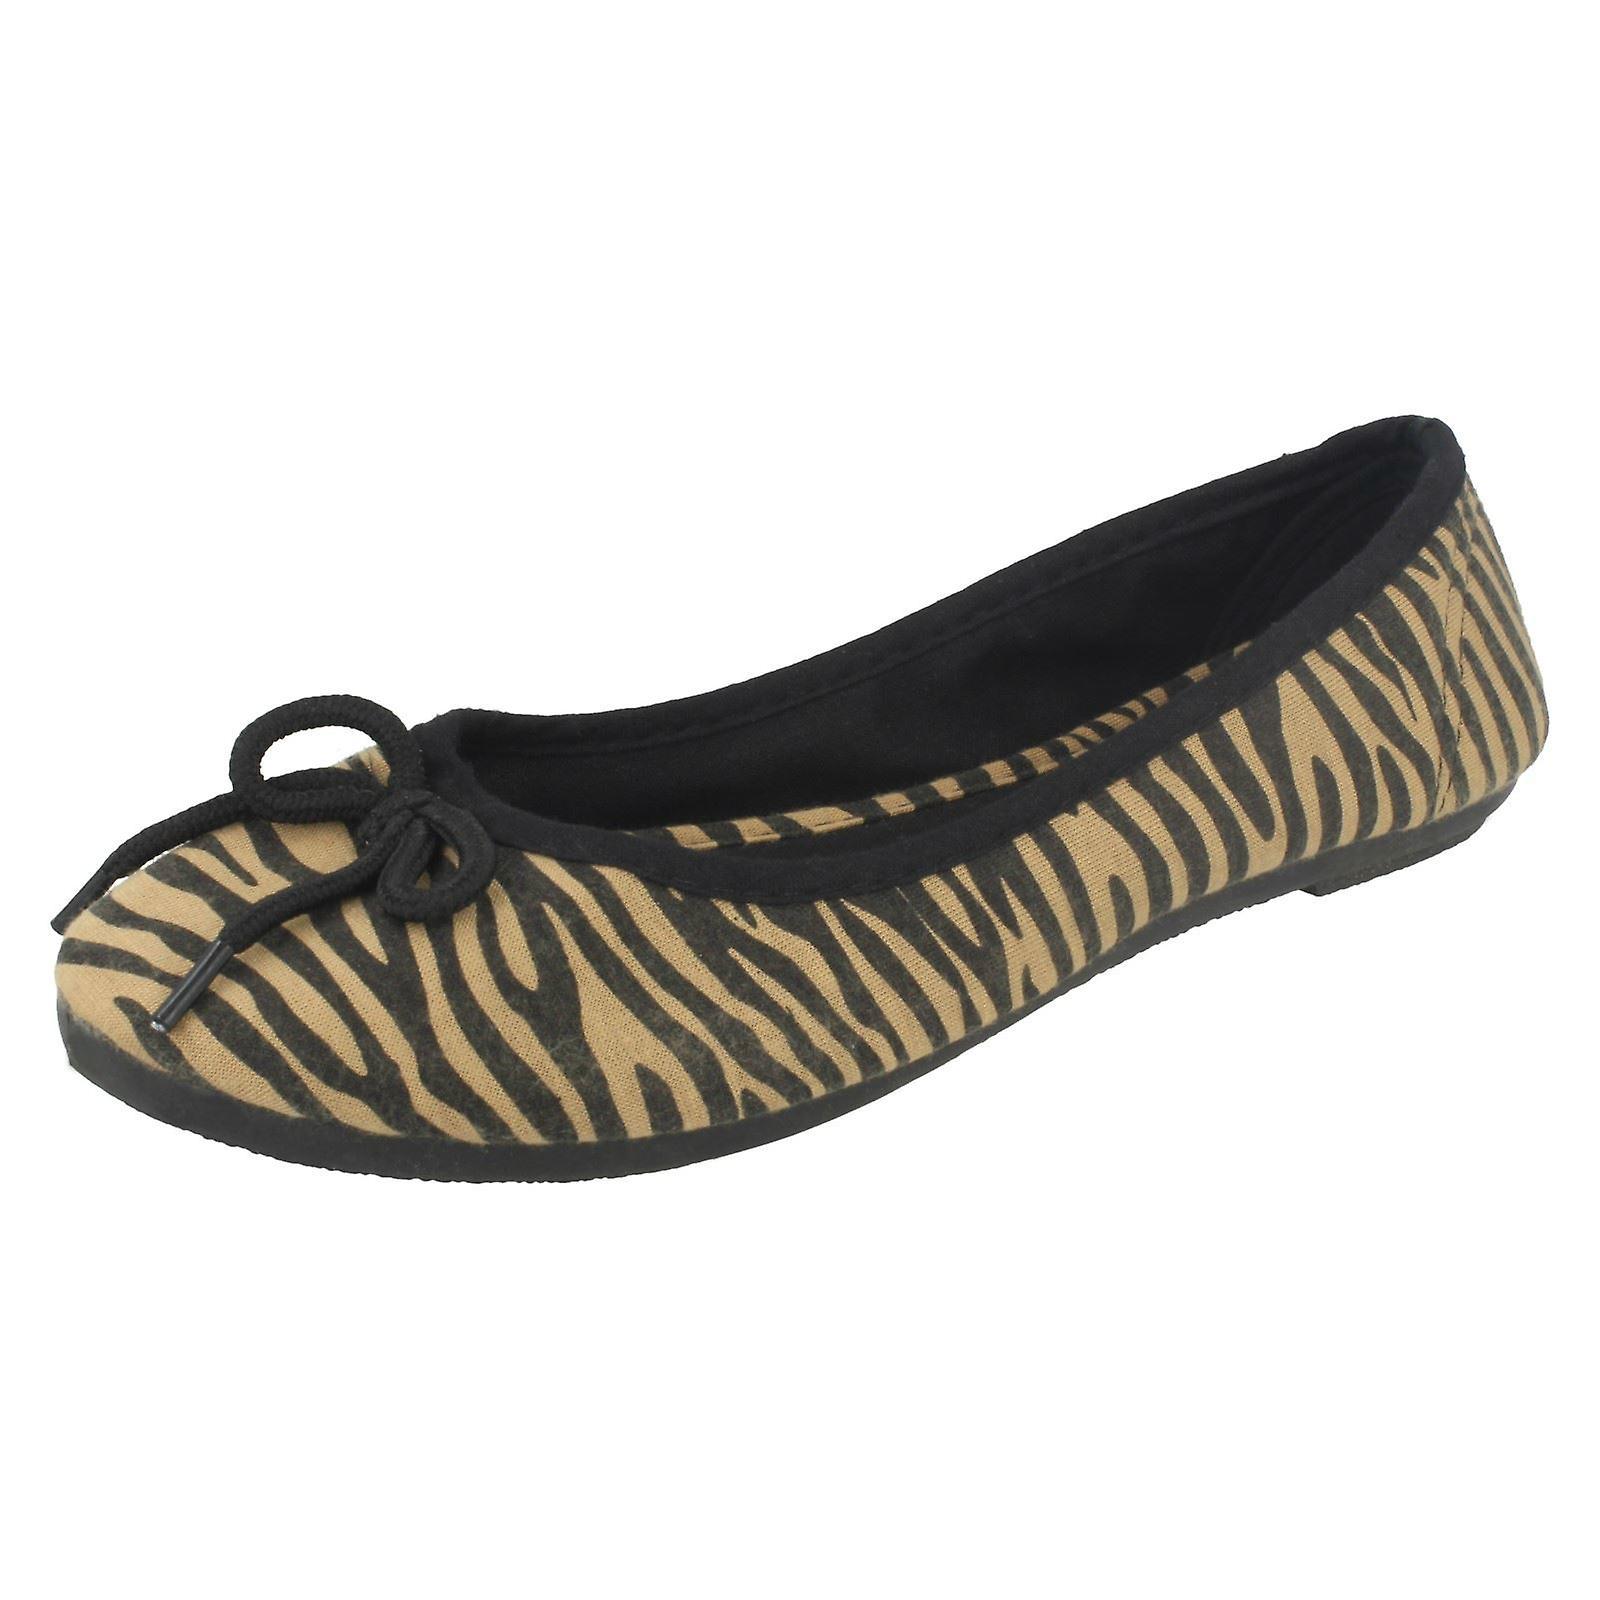 On Bow Ballerina Vamp Flat On Slip Ladies Spot F8794 qYzFTxp